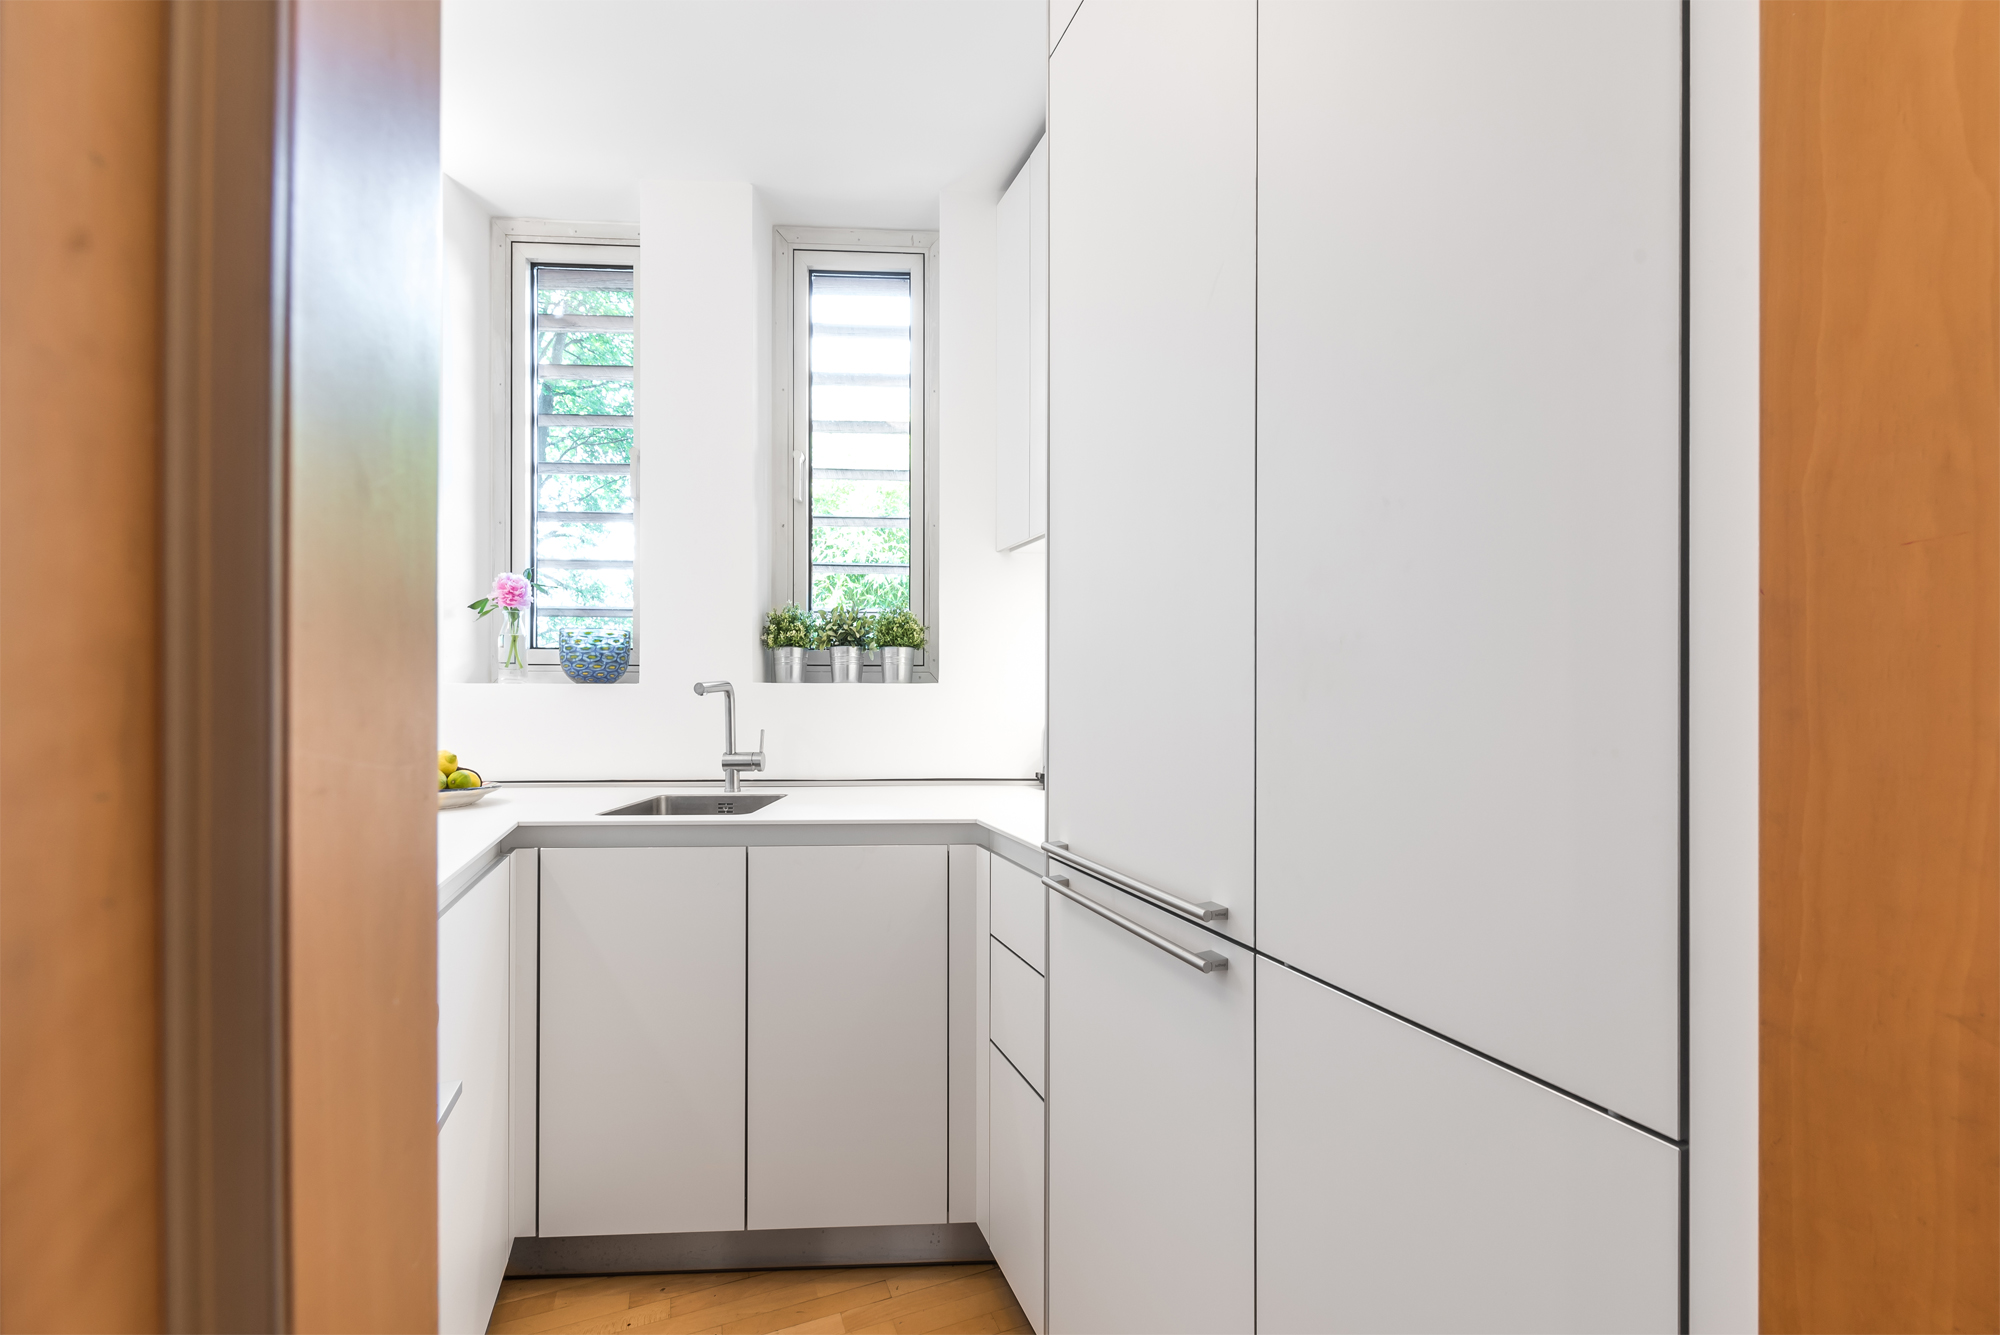 Full Size of Miniküche Mit Kühlschrank Ikea Miniküche 100 Cm Breit Mit Kühlschrank Miniküche Mit Kühlschrank 90 Cm Miniküche Mit Kühlschrank Buche Küche Miniküche Mit Kühlschrank